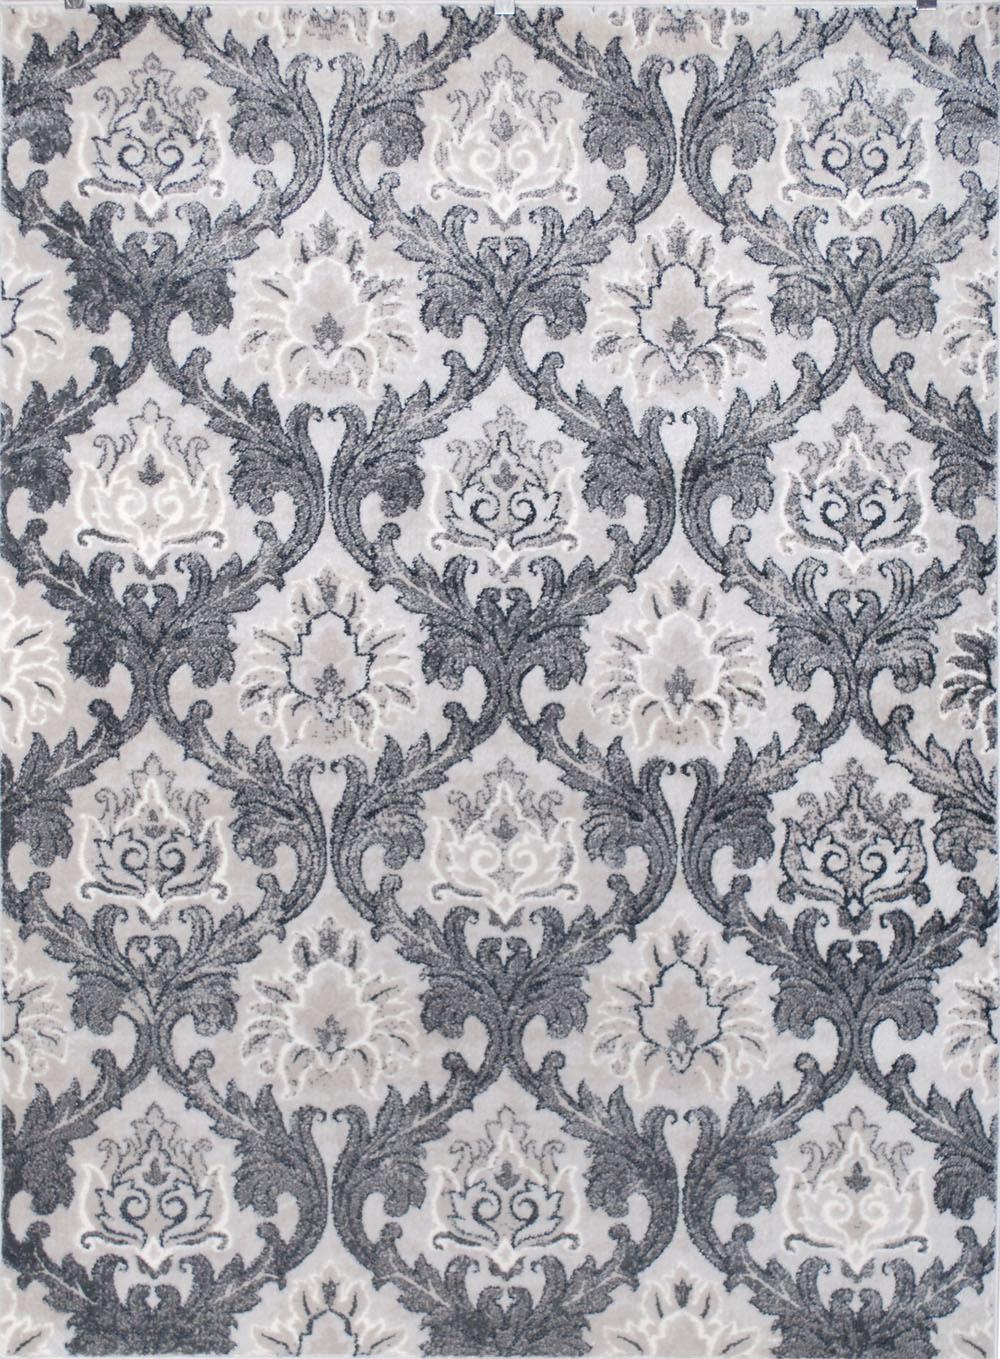 Contemporary Beige Carpet Scrolls Swirls Vines Leaves